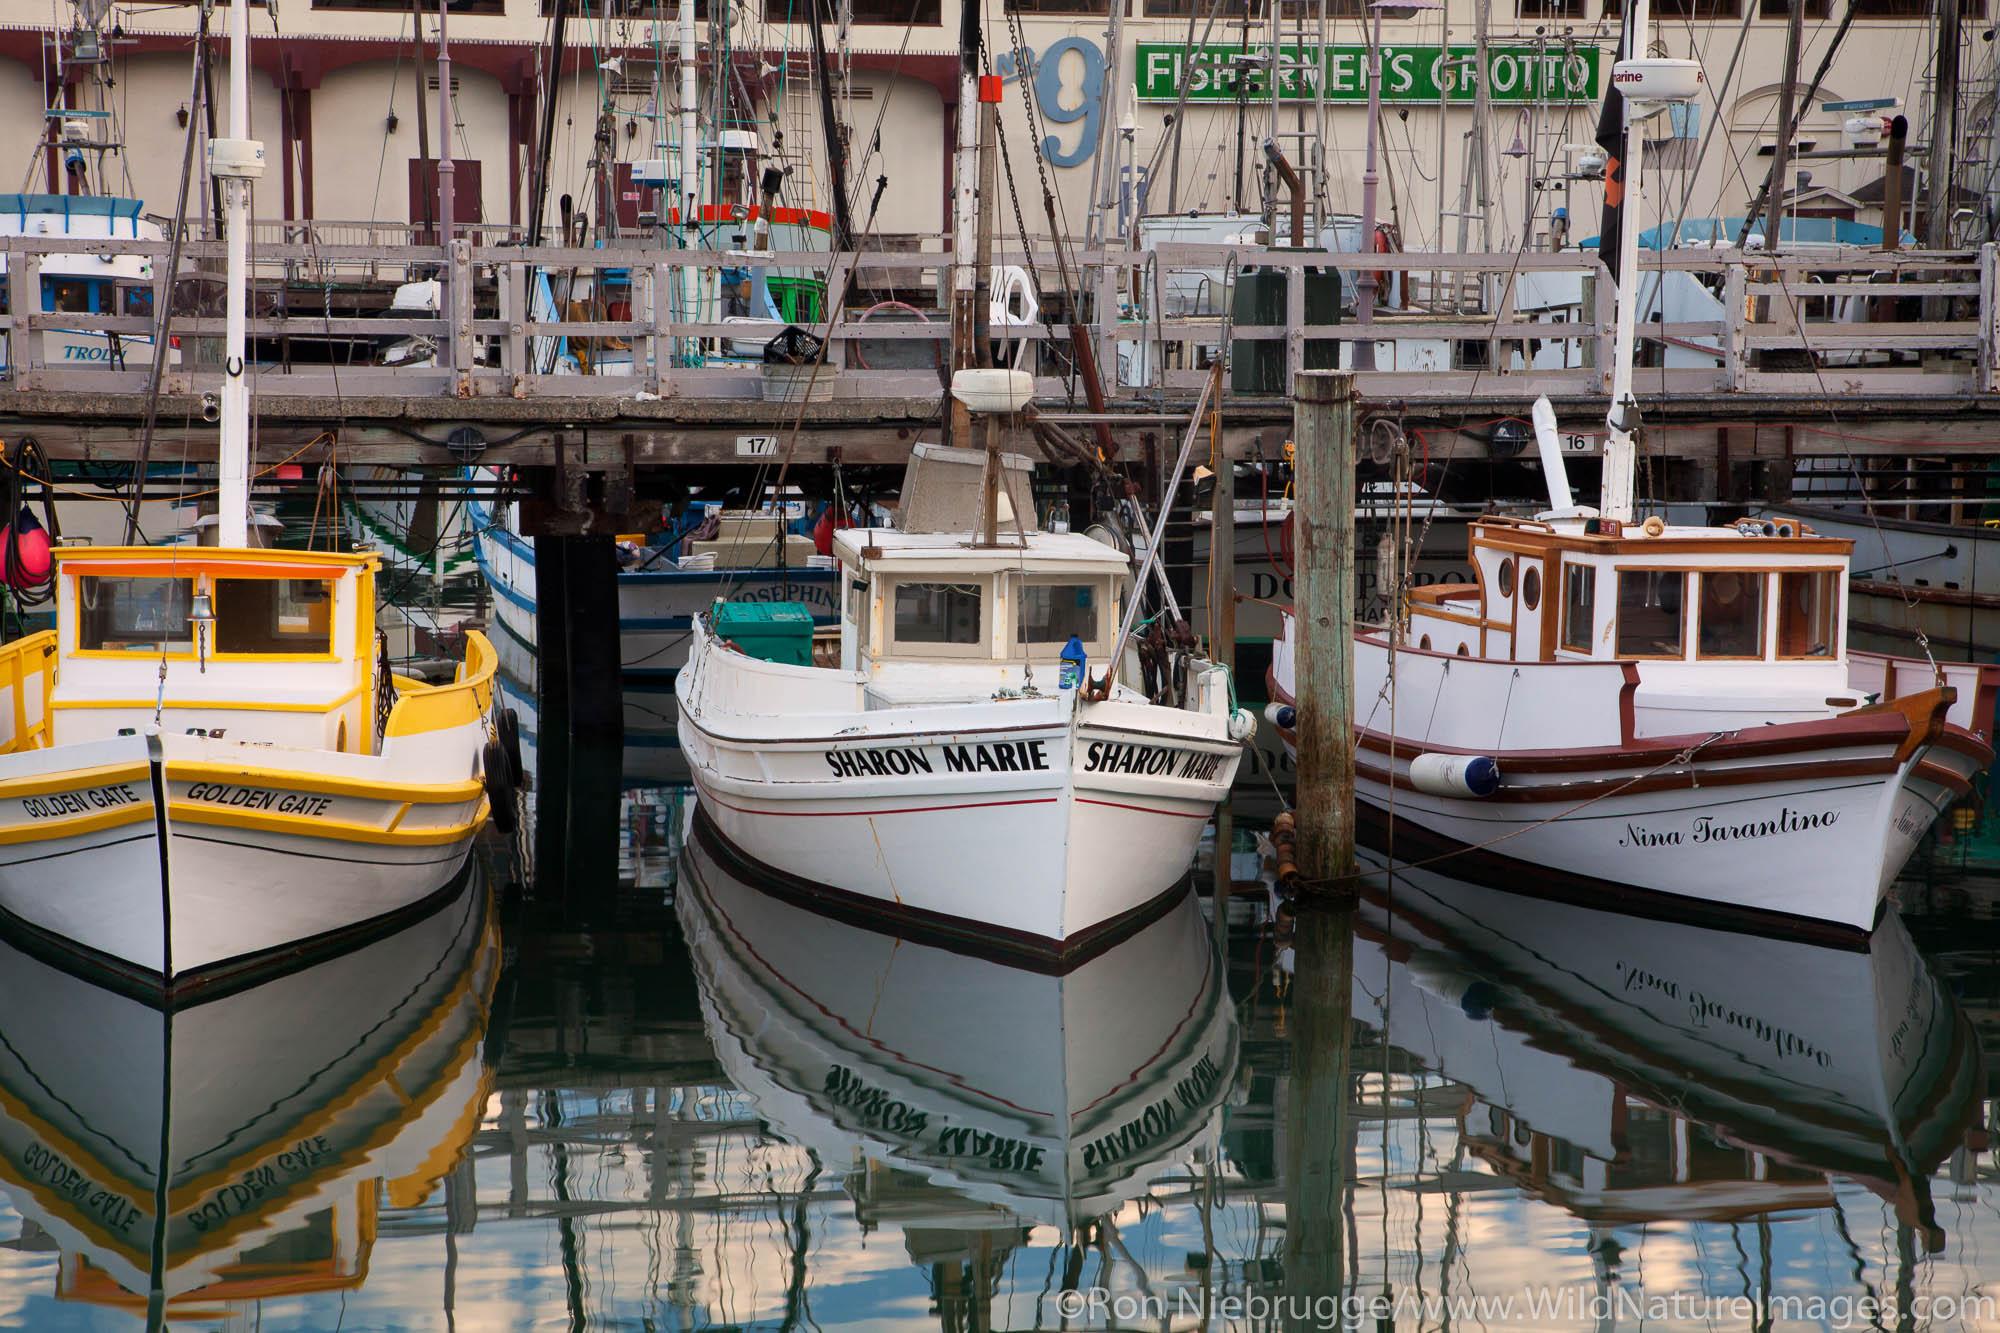 Monterey Hull Boats, Fisherman's Wharf, San Francisco, CA